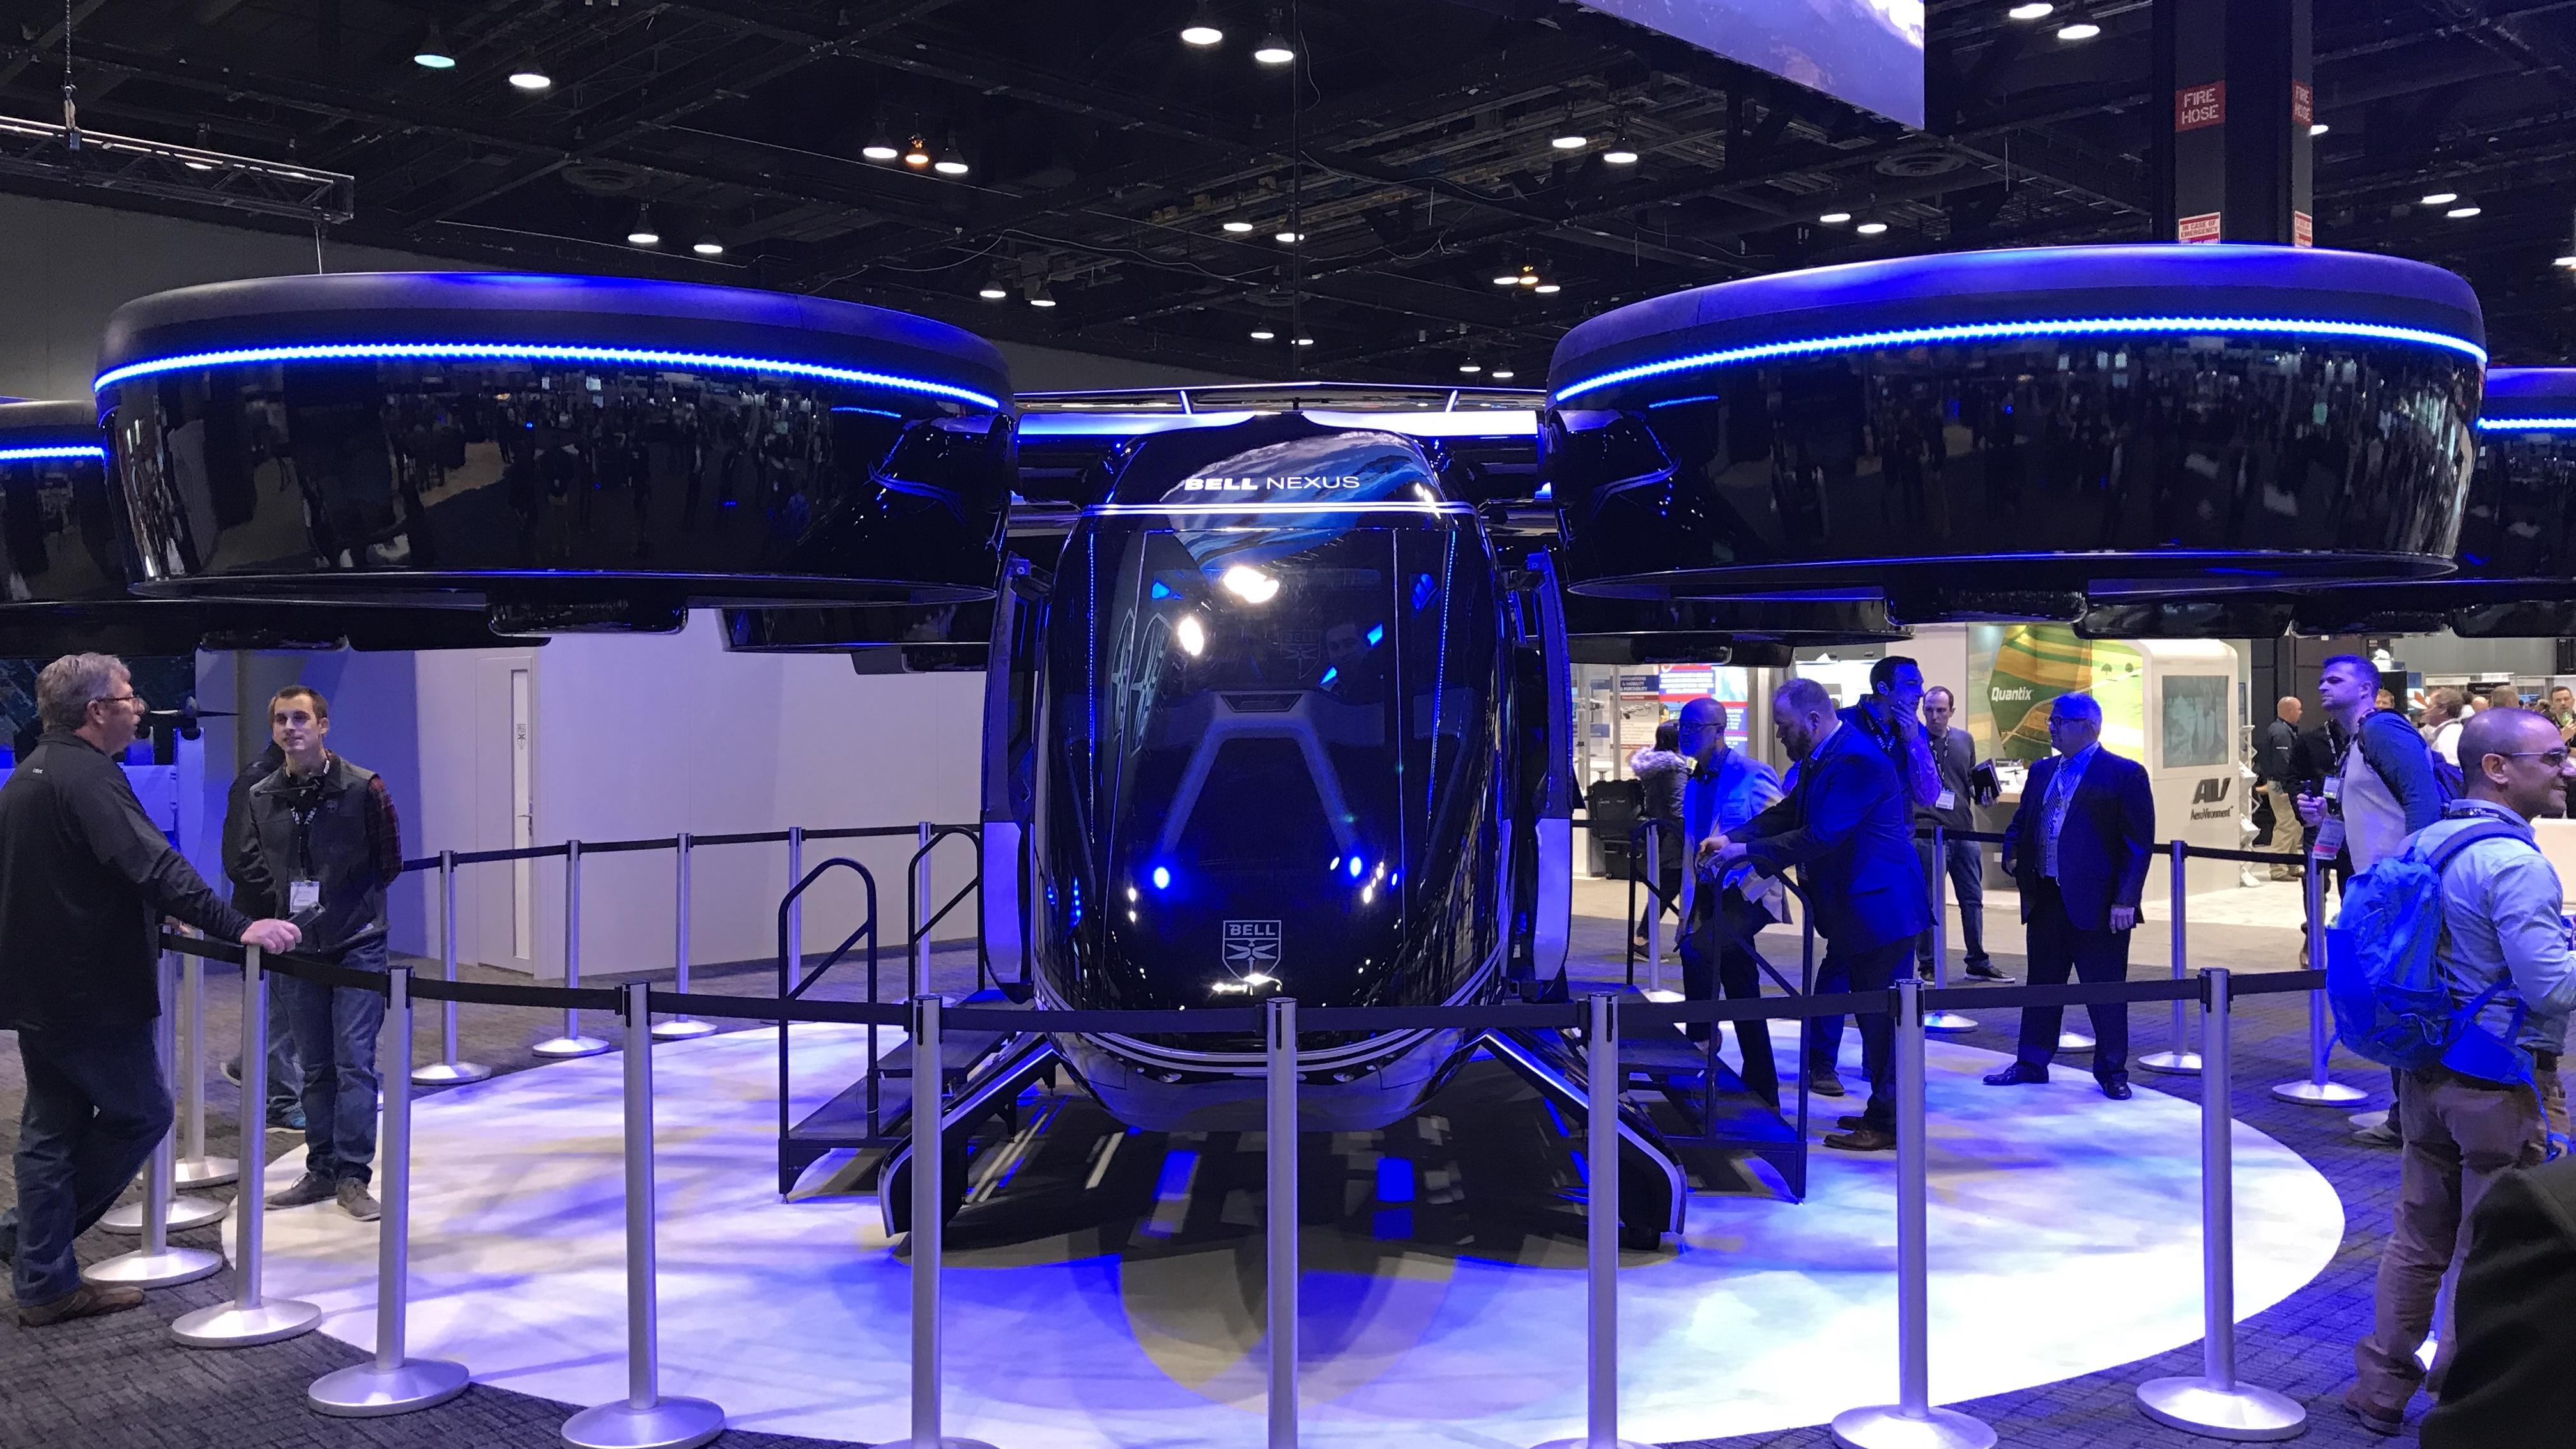 bell nexus drone